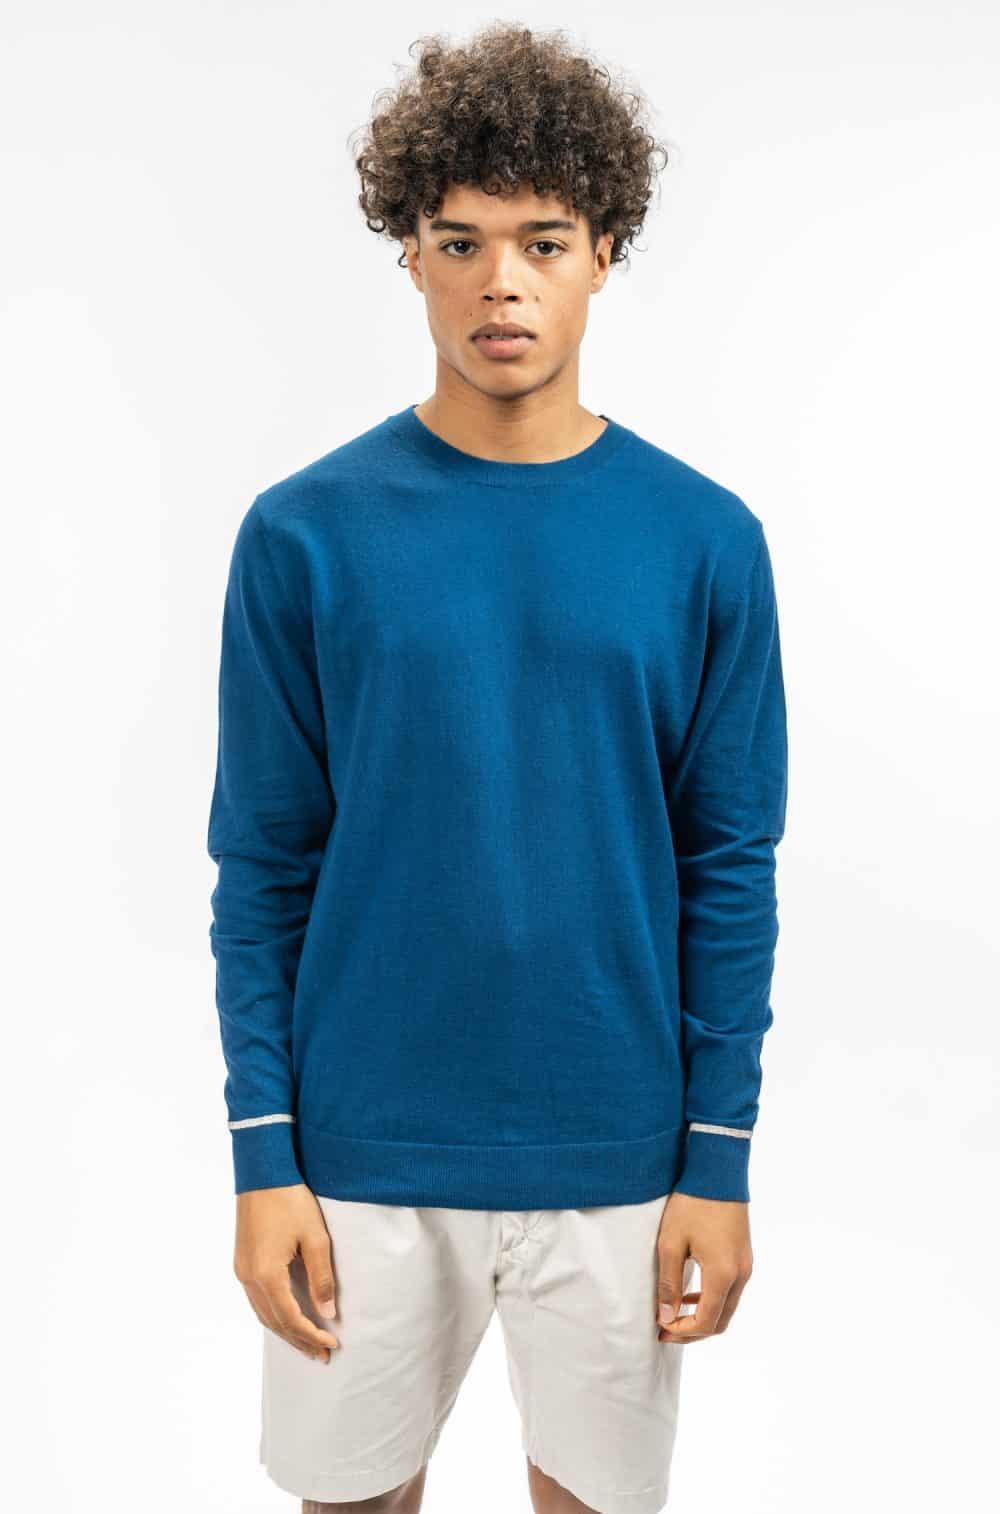 Castart Fordham Knitwear SS19